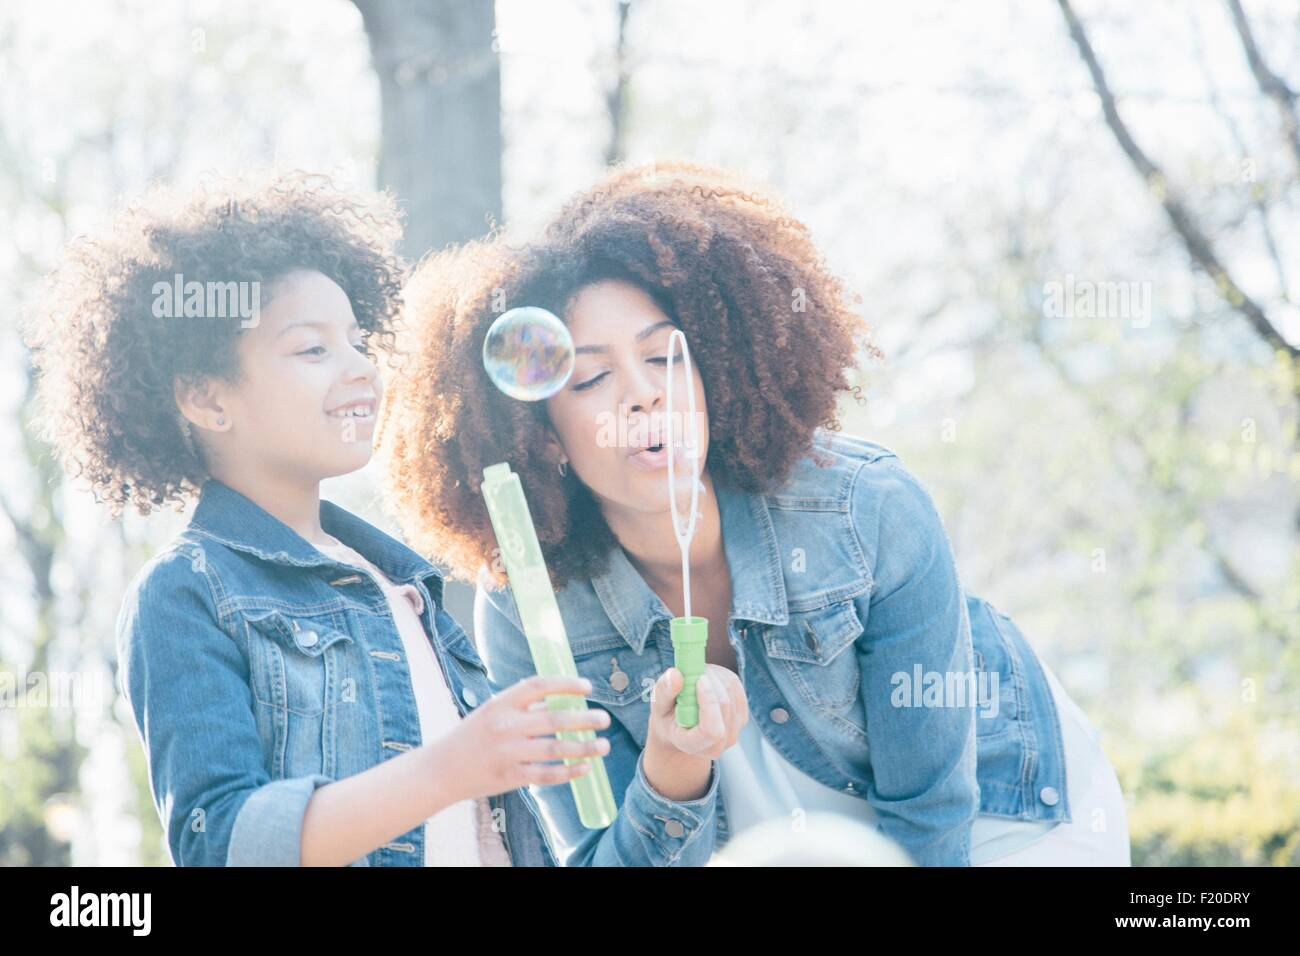 Madre e hija soplando burbujas juntos Imagen De Stock